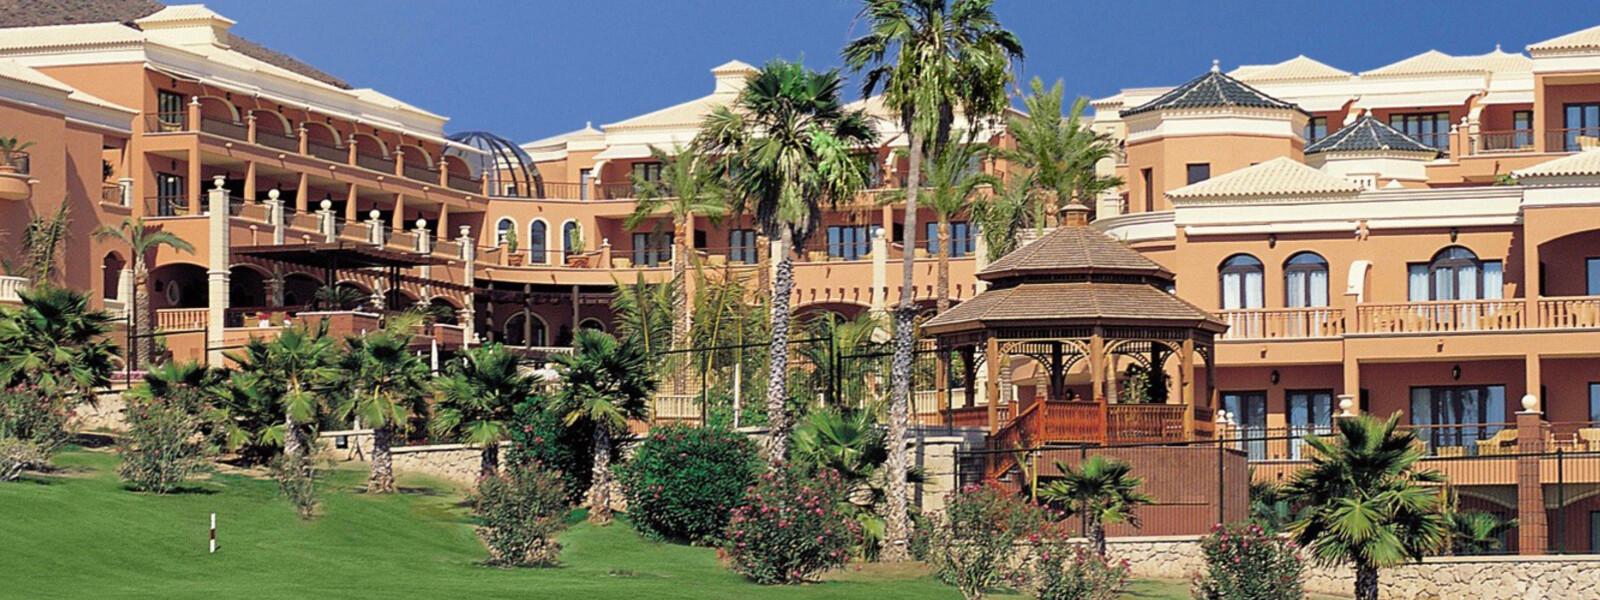 Las Madrigueras Golf Resort & Spa - ein Golfmotion Top Partner